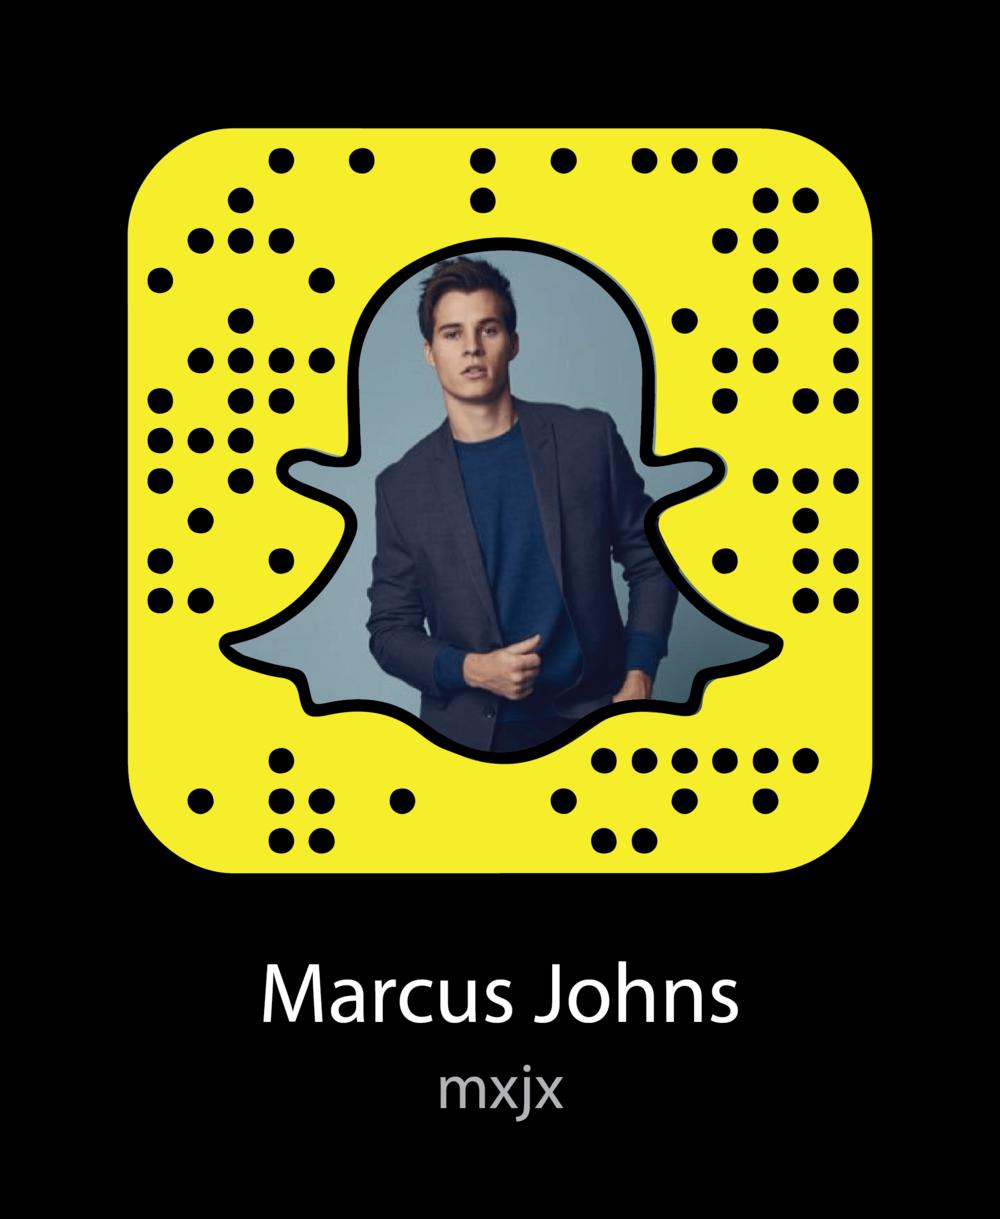 marcus-johns-celebrity-snapchat-snapcode